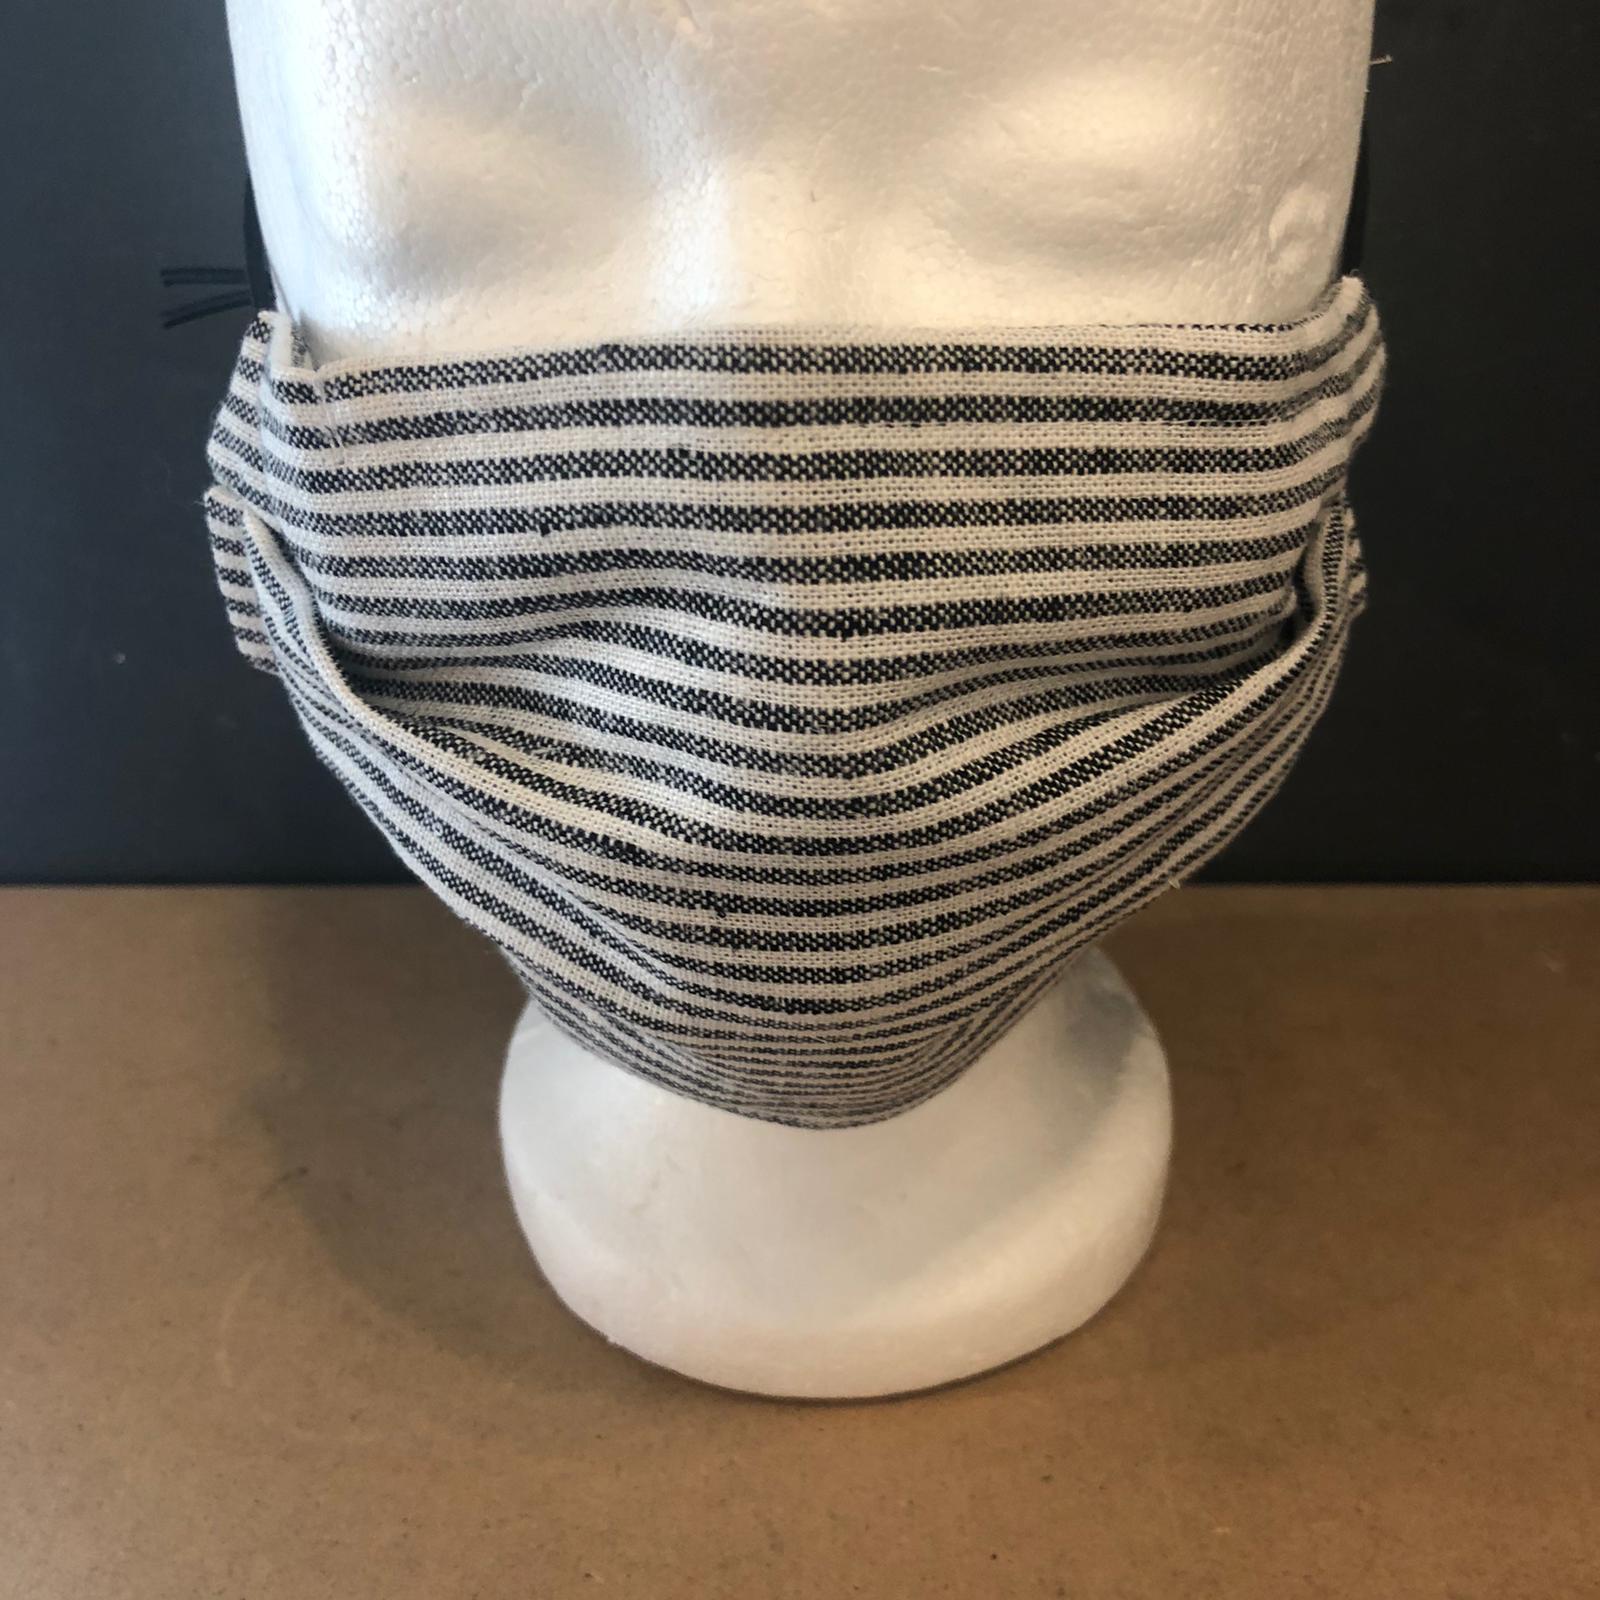 LütteLotta X Stoff-Maske Gestreift